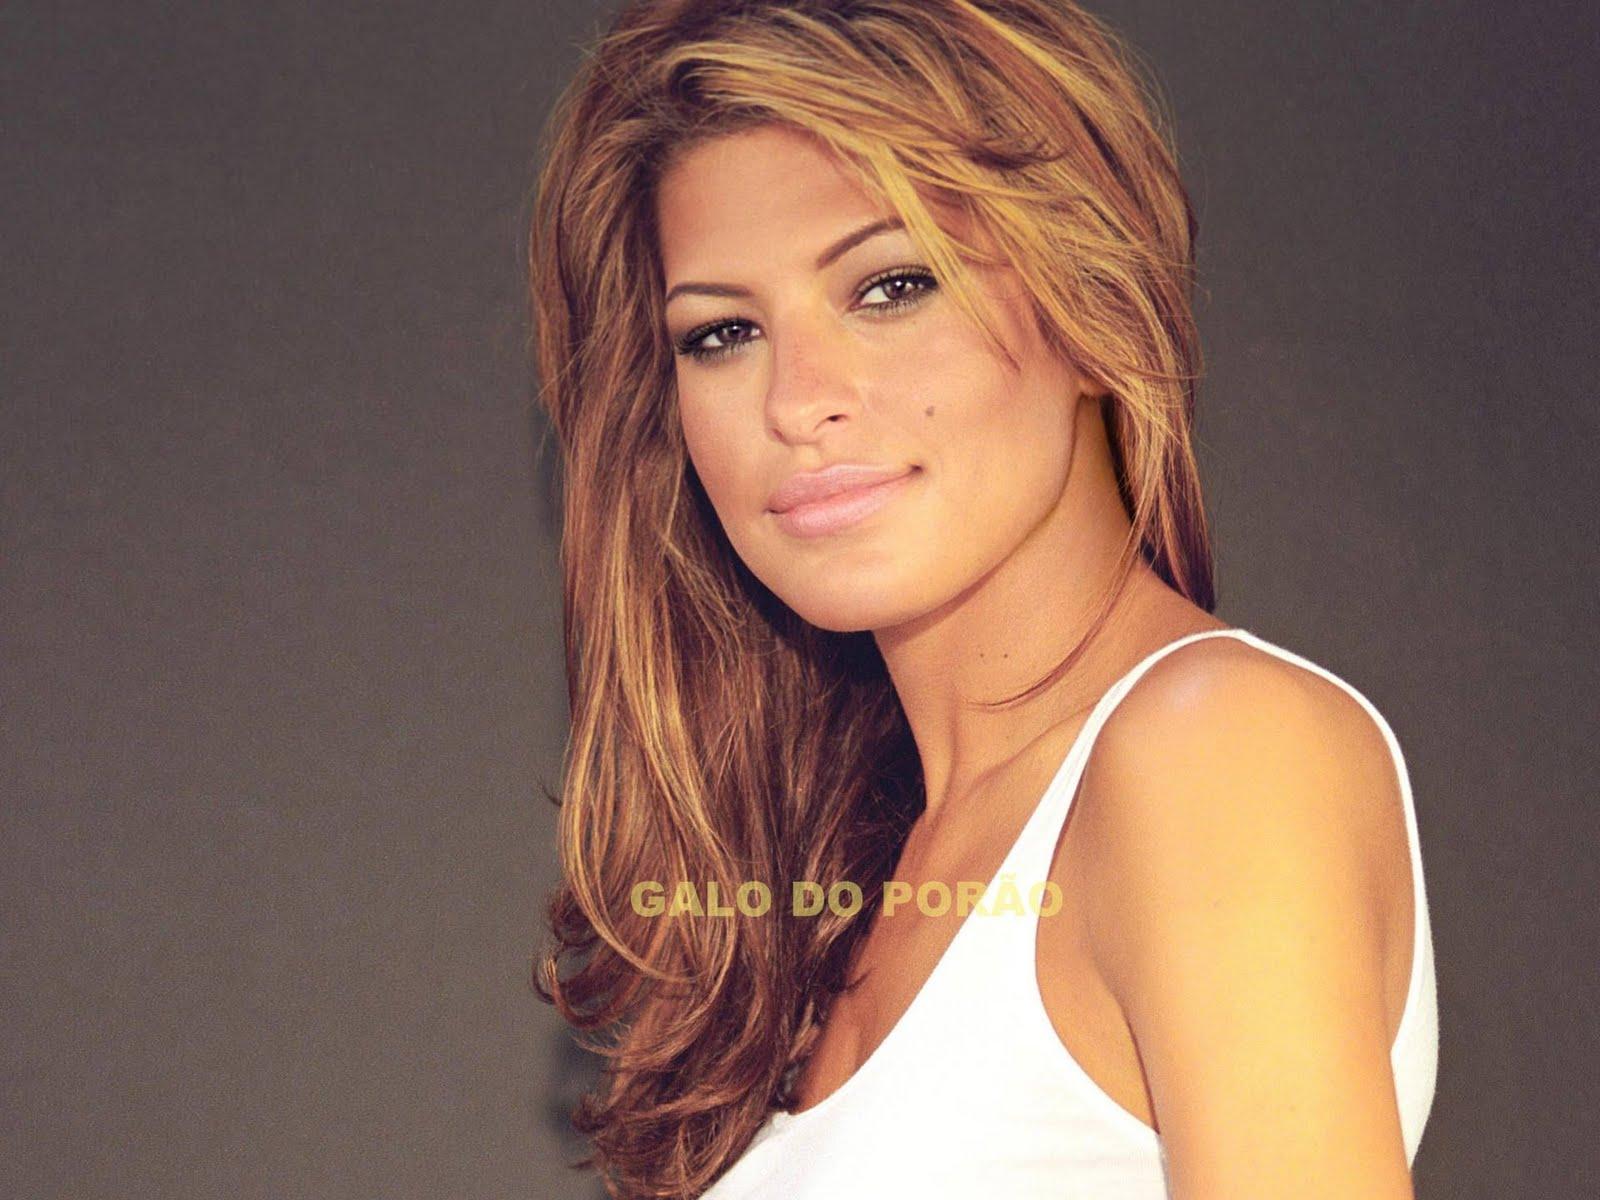 http://4.bp.blogspot.com/_6QURoNy4-5k/TK9QyhlMB4I/AAAAAAAAID4/VPRFHG70Q9s/s1600/Eva+Mendes.jpg